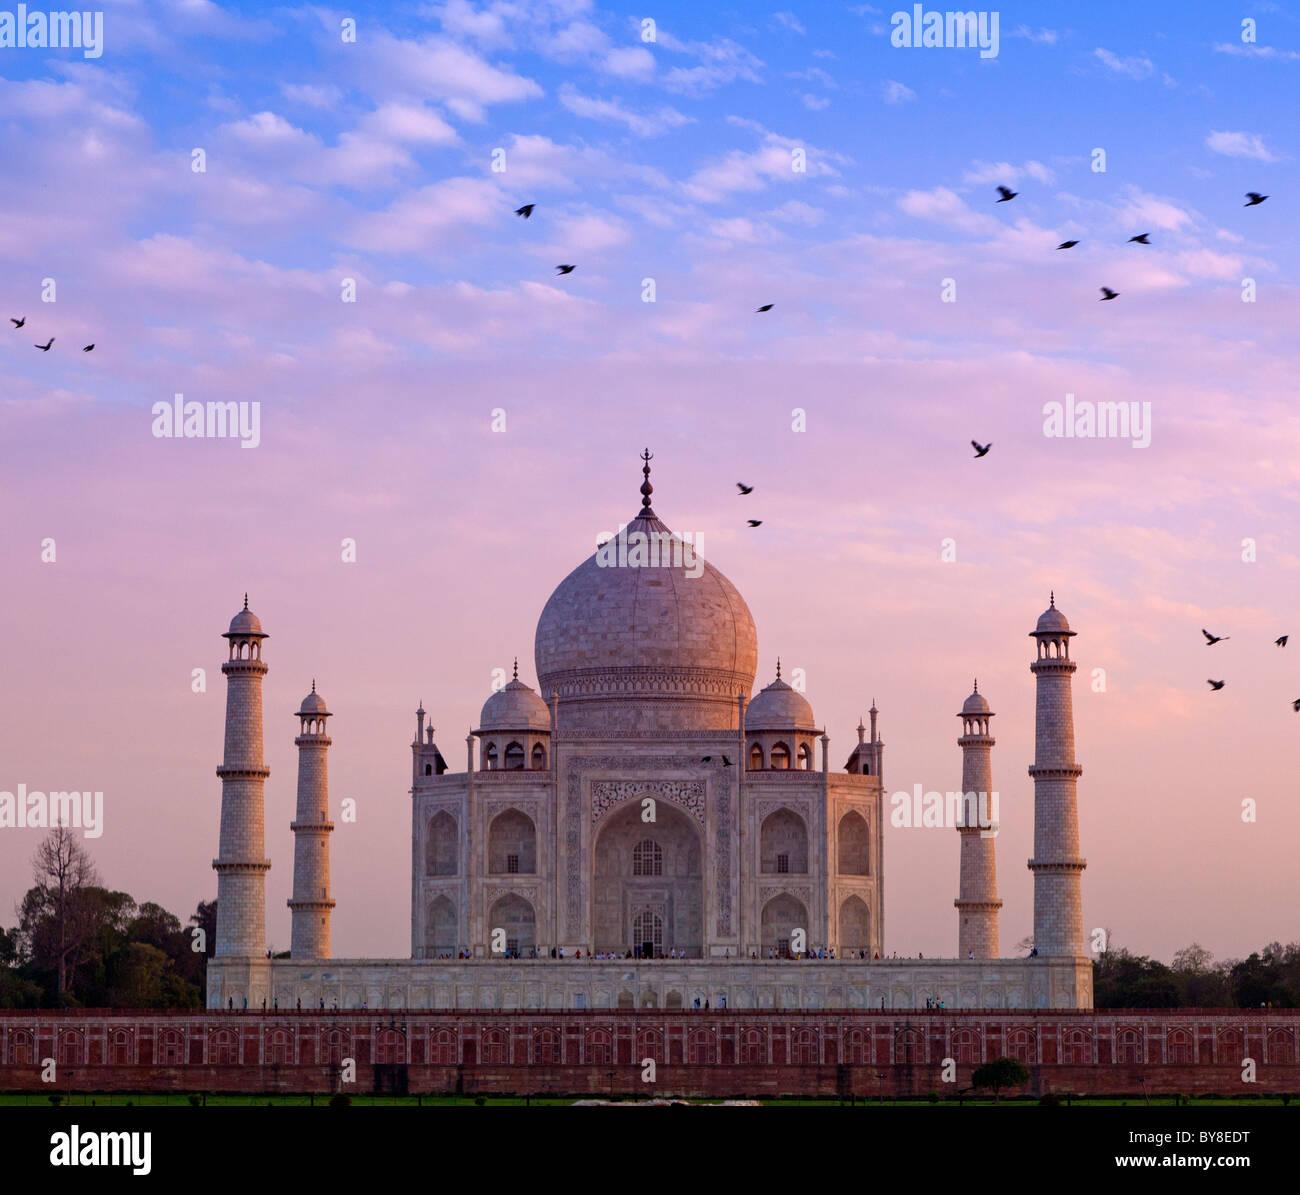 India, Uttar Pradesh, Agra, uccelli battenti vicino al Taj Mahal in tarda serata luce Immagini Stock